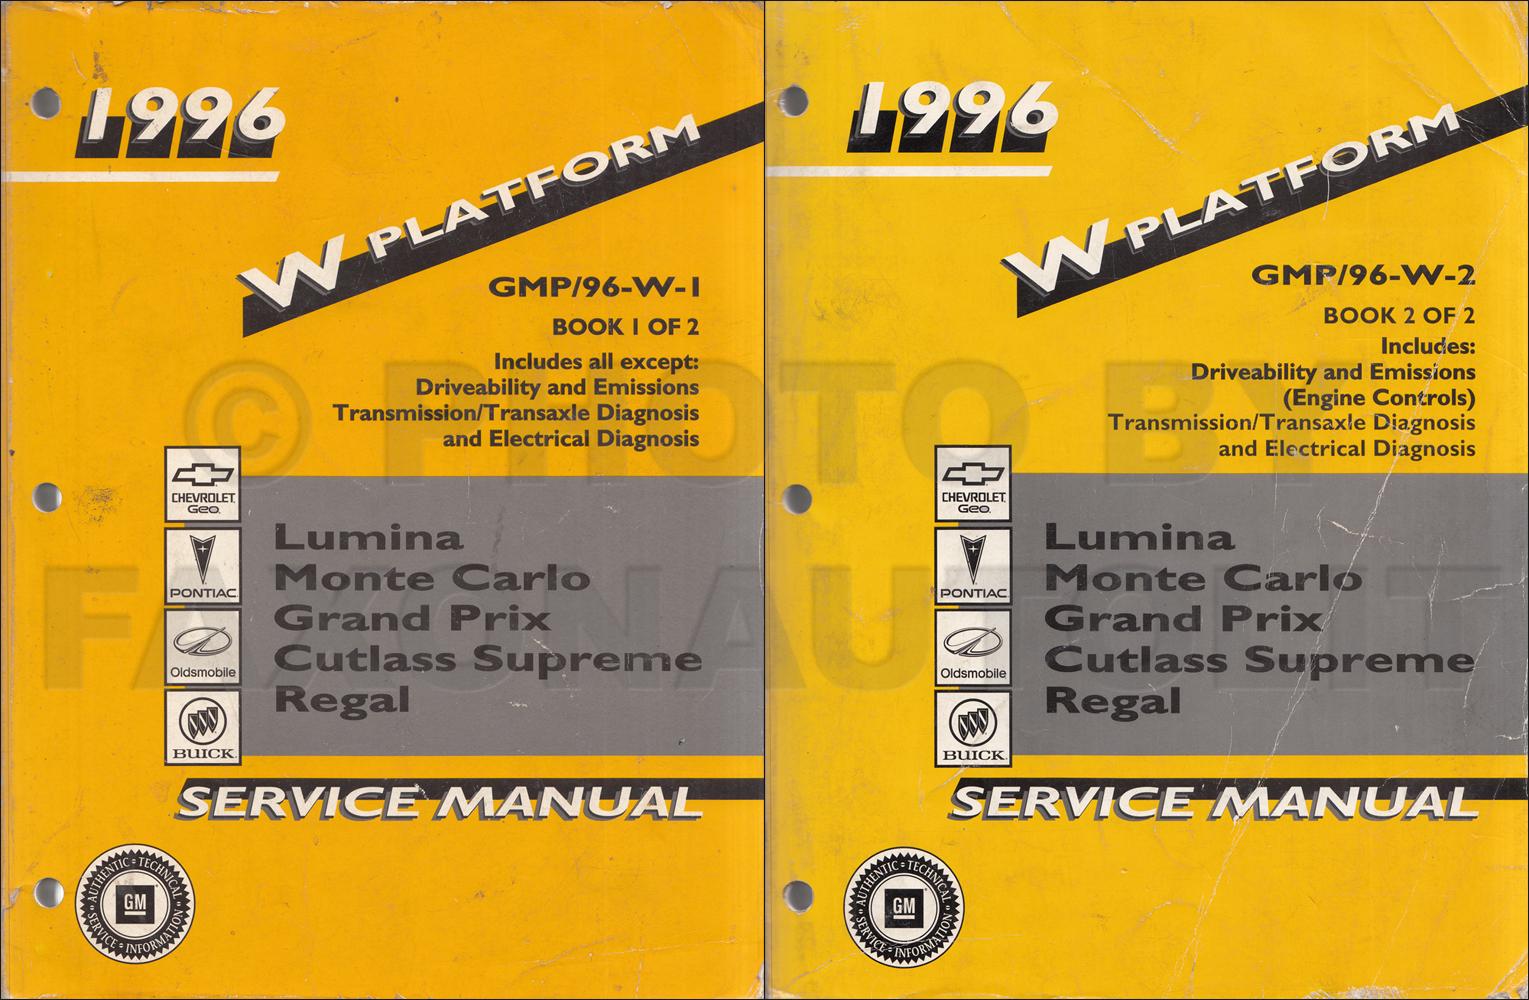 1996 Lumina Monte Carlo Grand Prix Cutlass Supreme Regal Repair Shop Manual